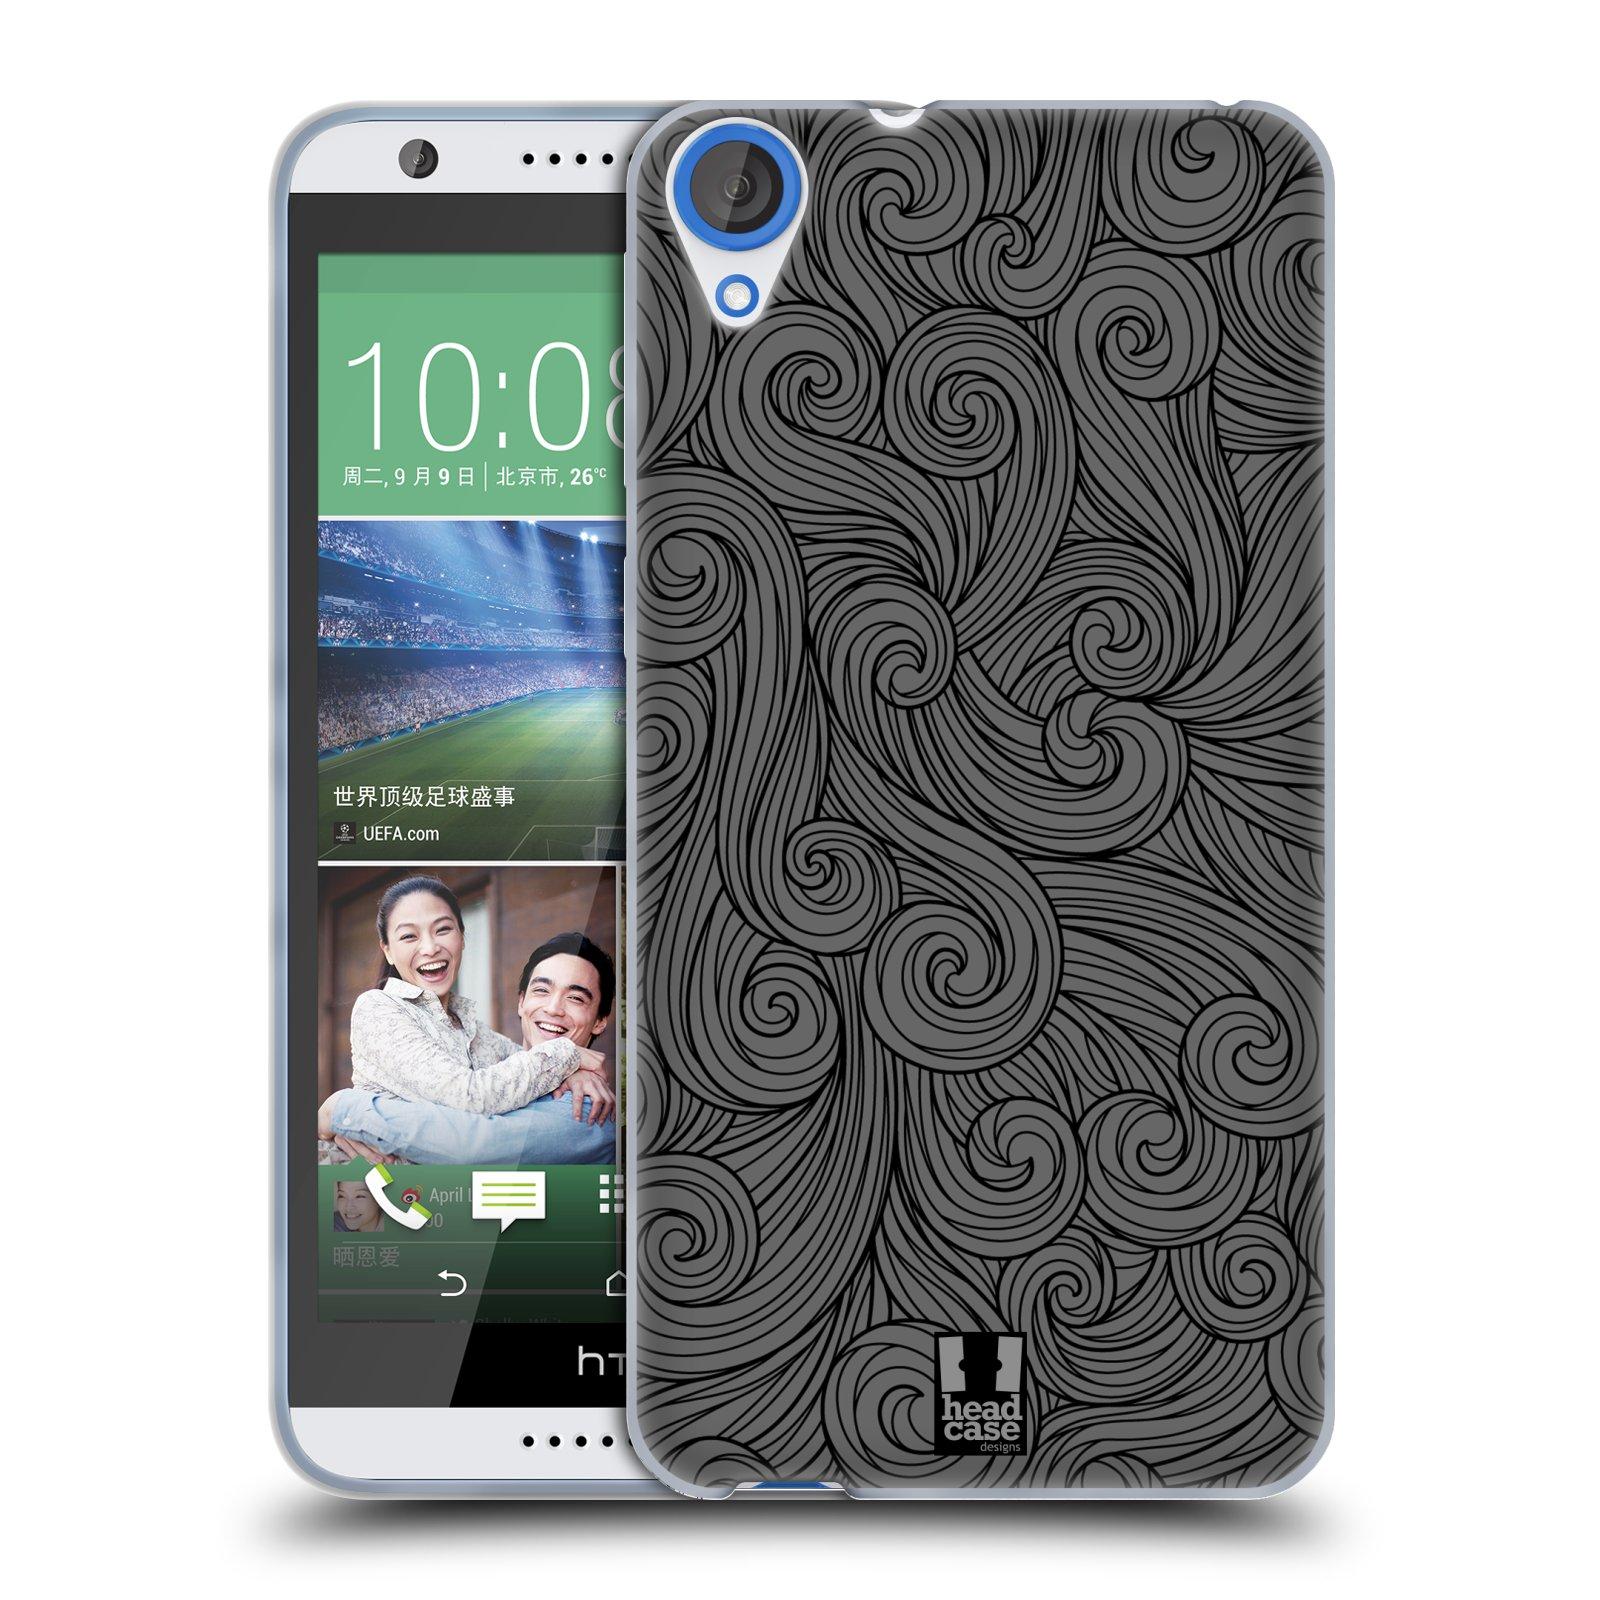 Silikonové pouzdro na mobil HTC Desire 820 HEAD CASE Dark Grey Swirls (Silikonový kryt či obal na mobilní telefon HTC Desire 820)